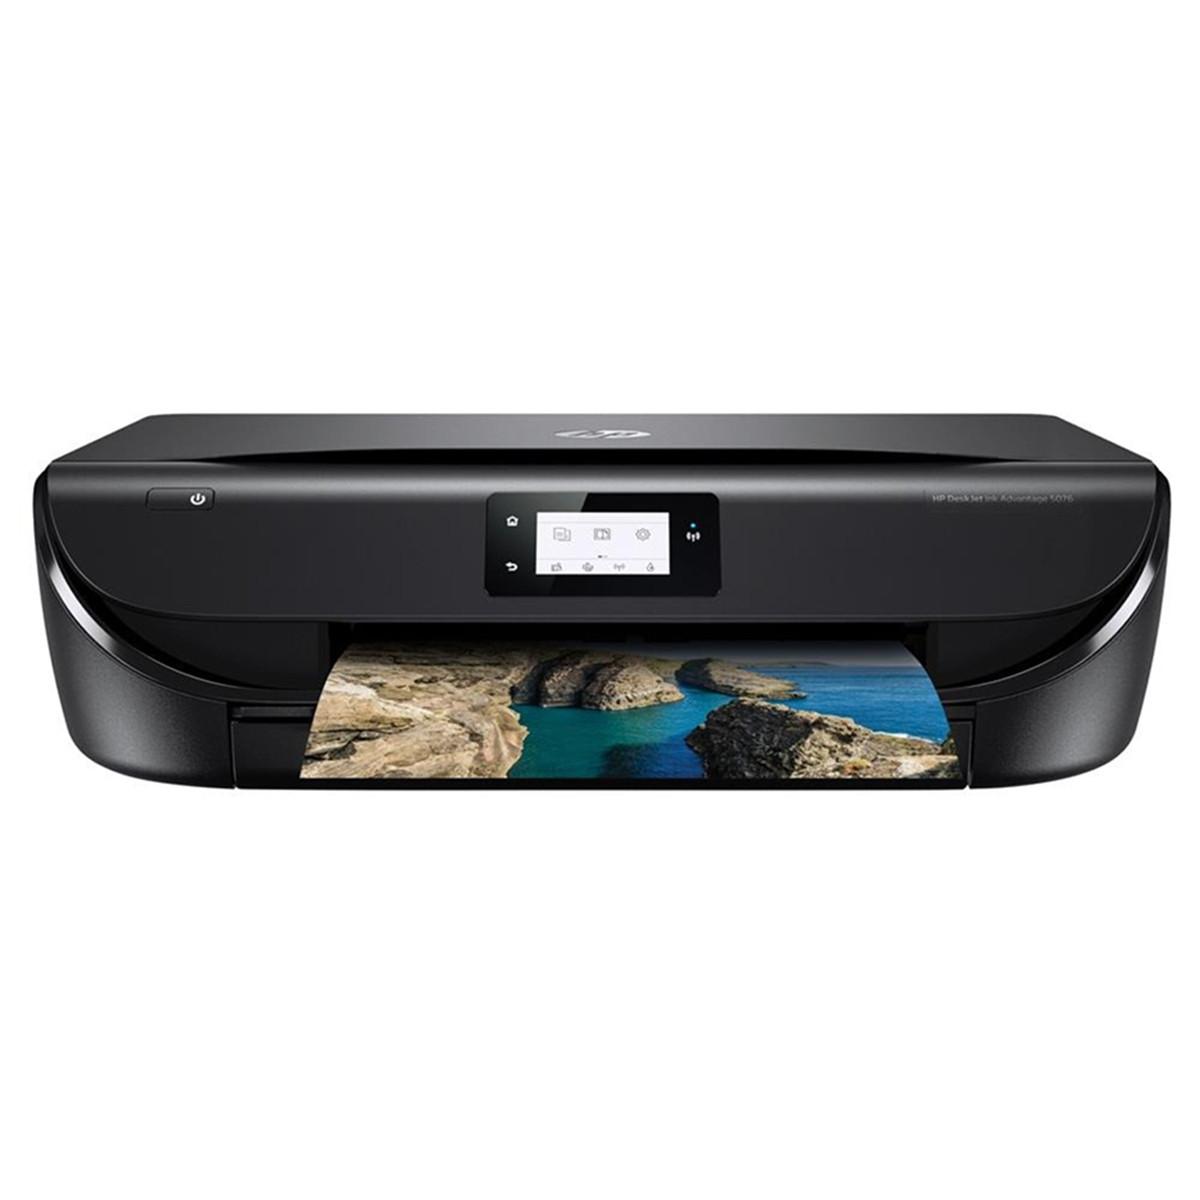 Impressora HP DeskJet 5076 M2U87A | Multifuncional Ink Advatange com Wireless e Duplex